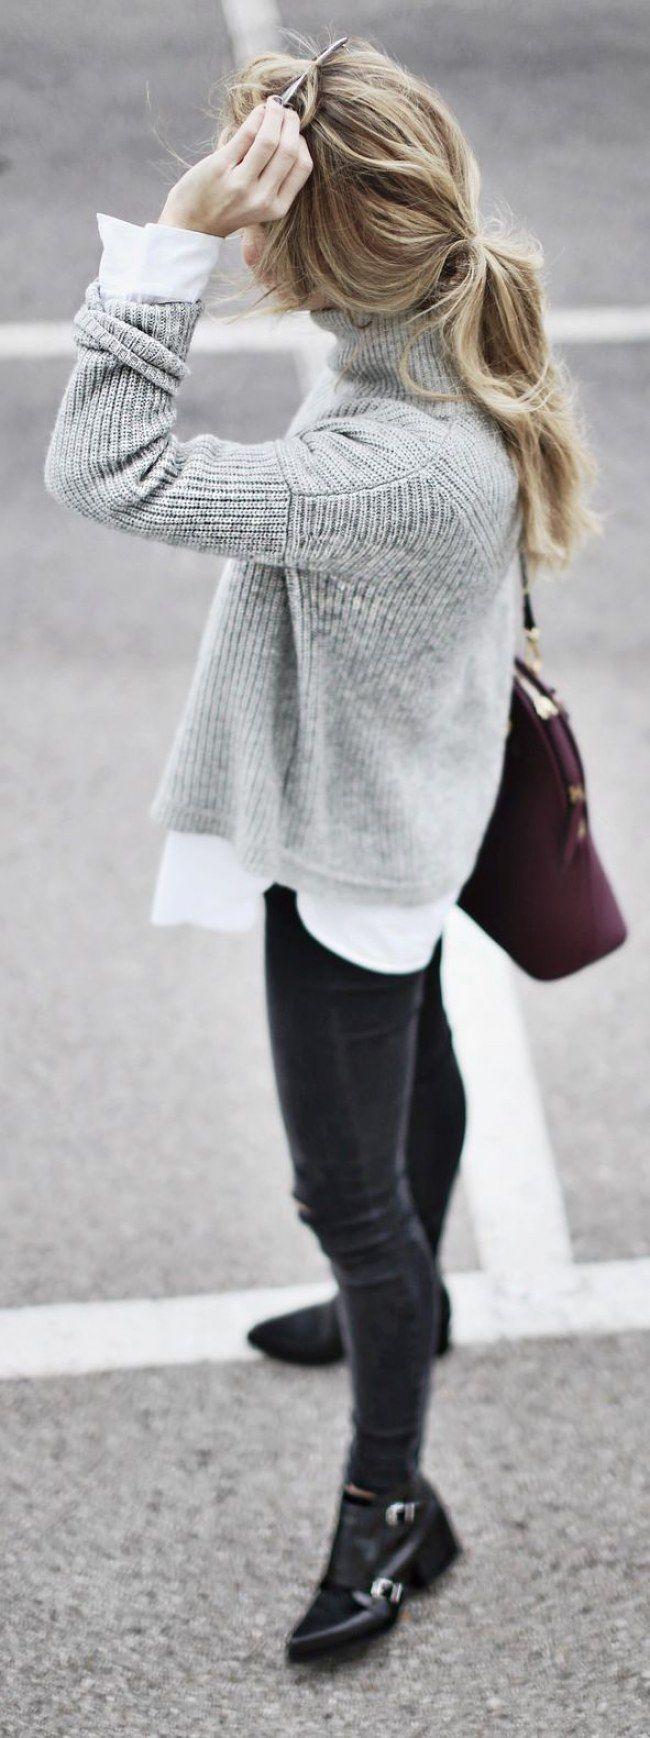 Suéter gola alta cinza